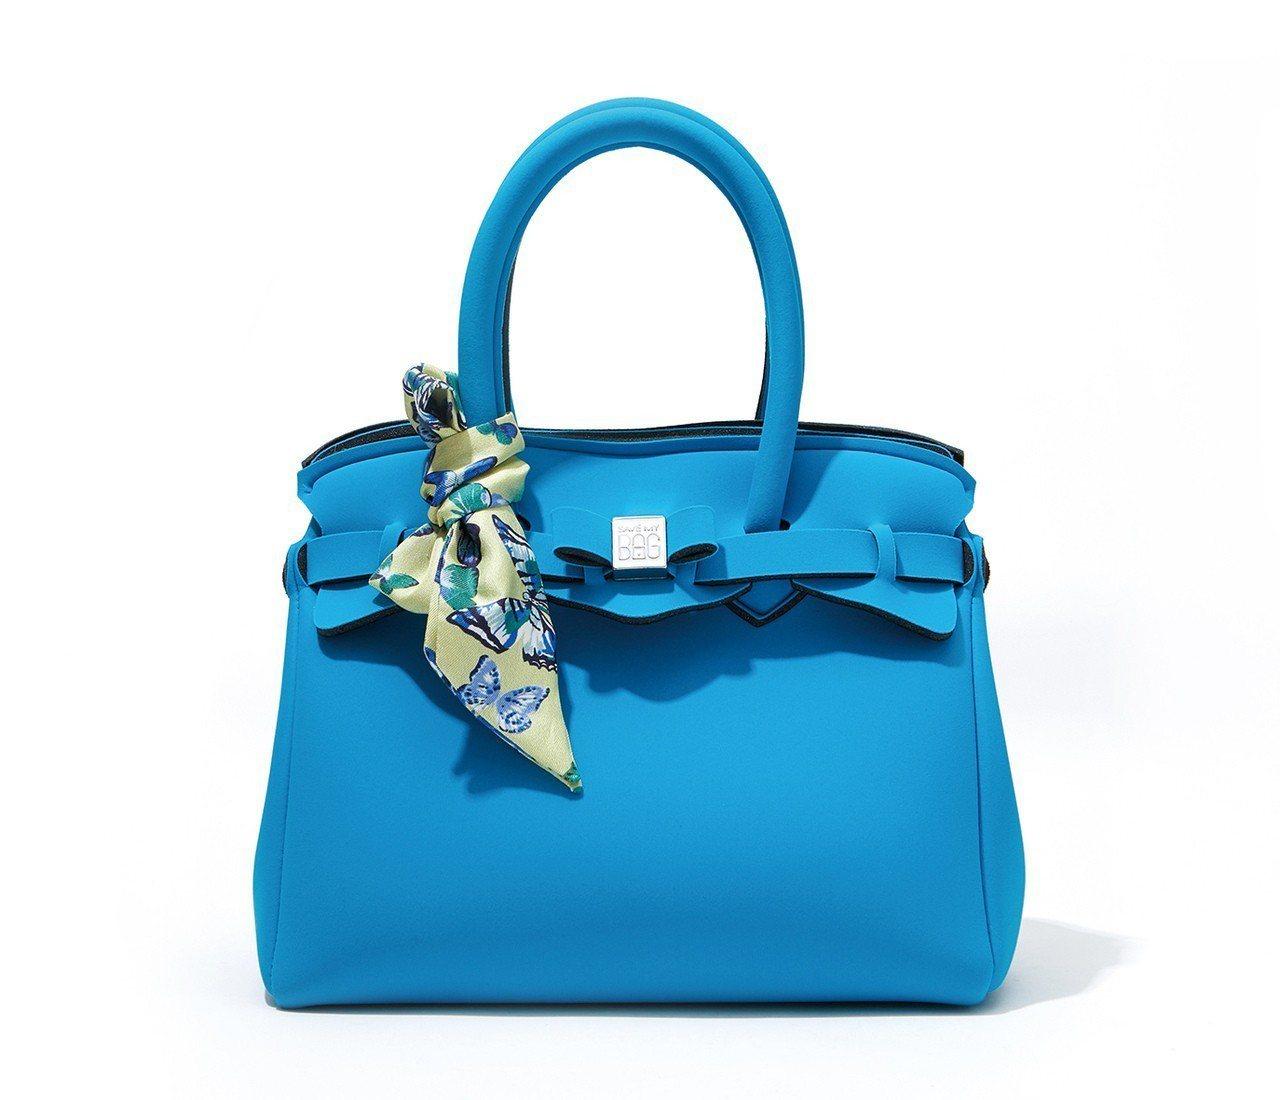 Save My Bag藍色手提包(含絲巾) 5,180元。圖/新光三越提供